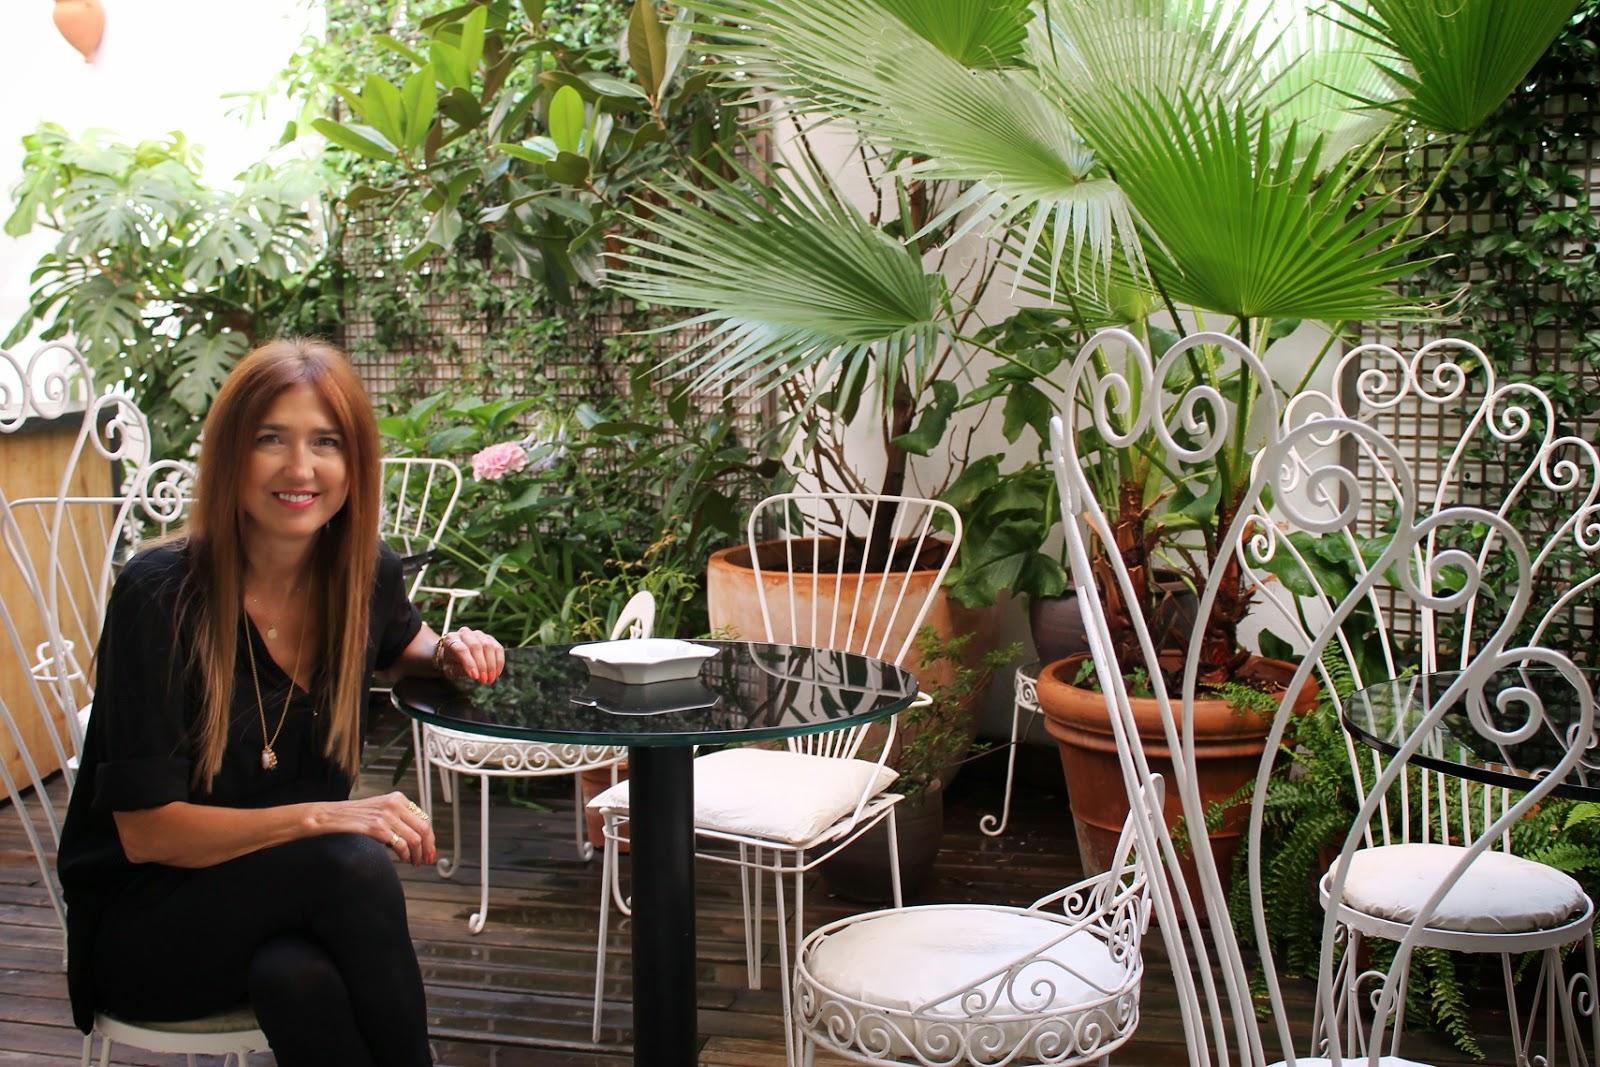 Juan Gatti, Designs, Elena Benarroch, leather, fashion style, party, look, lifestyle, Carmen Hummer